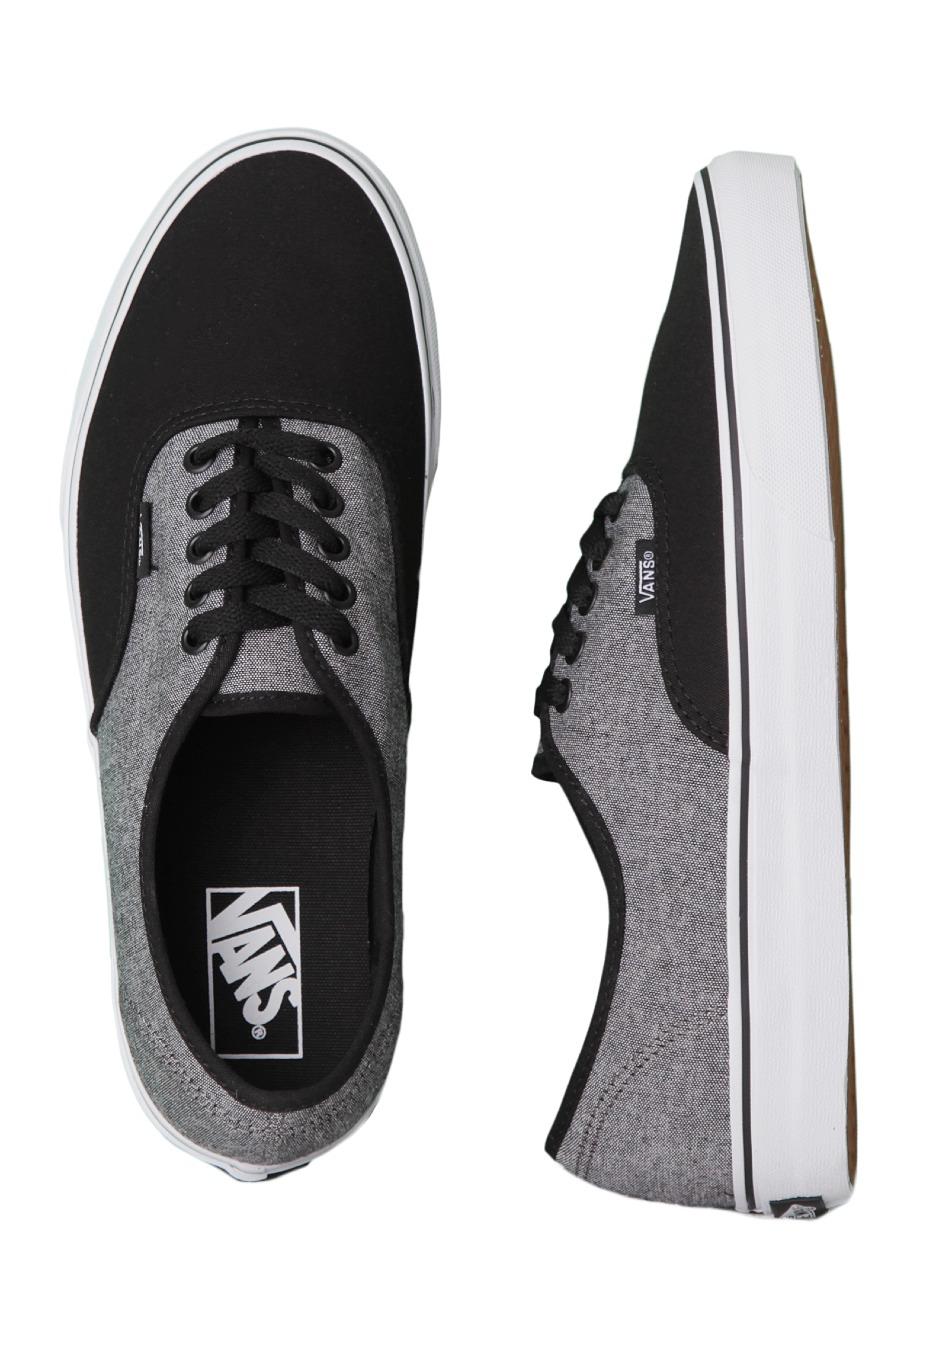 8d8b571f7f4 Vans - Authentic C C Black Pewter - Shoes - Impericon.com Worldwide